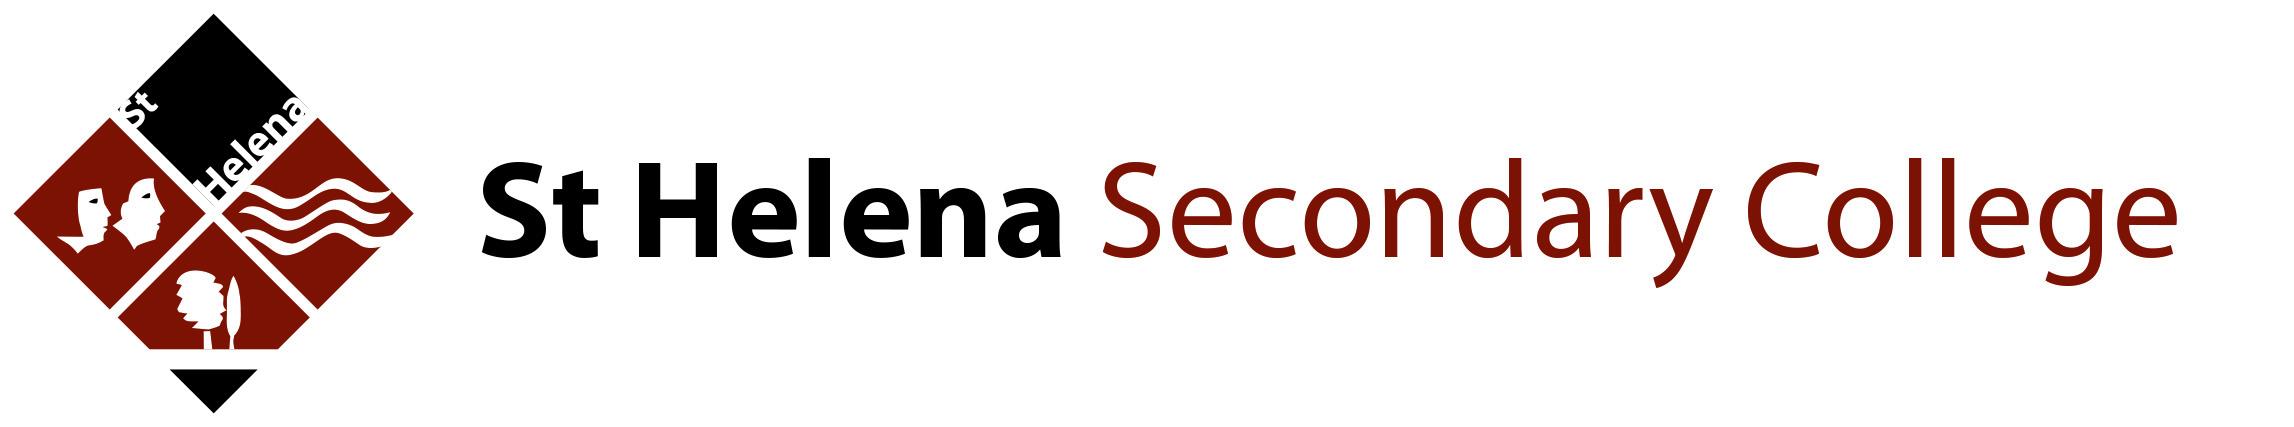 2015 Complete Logo 2